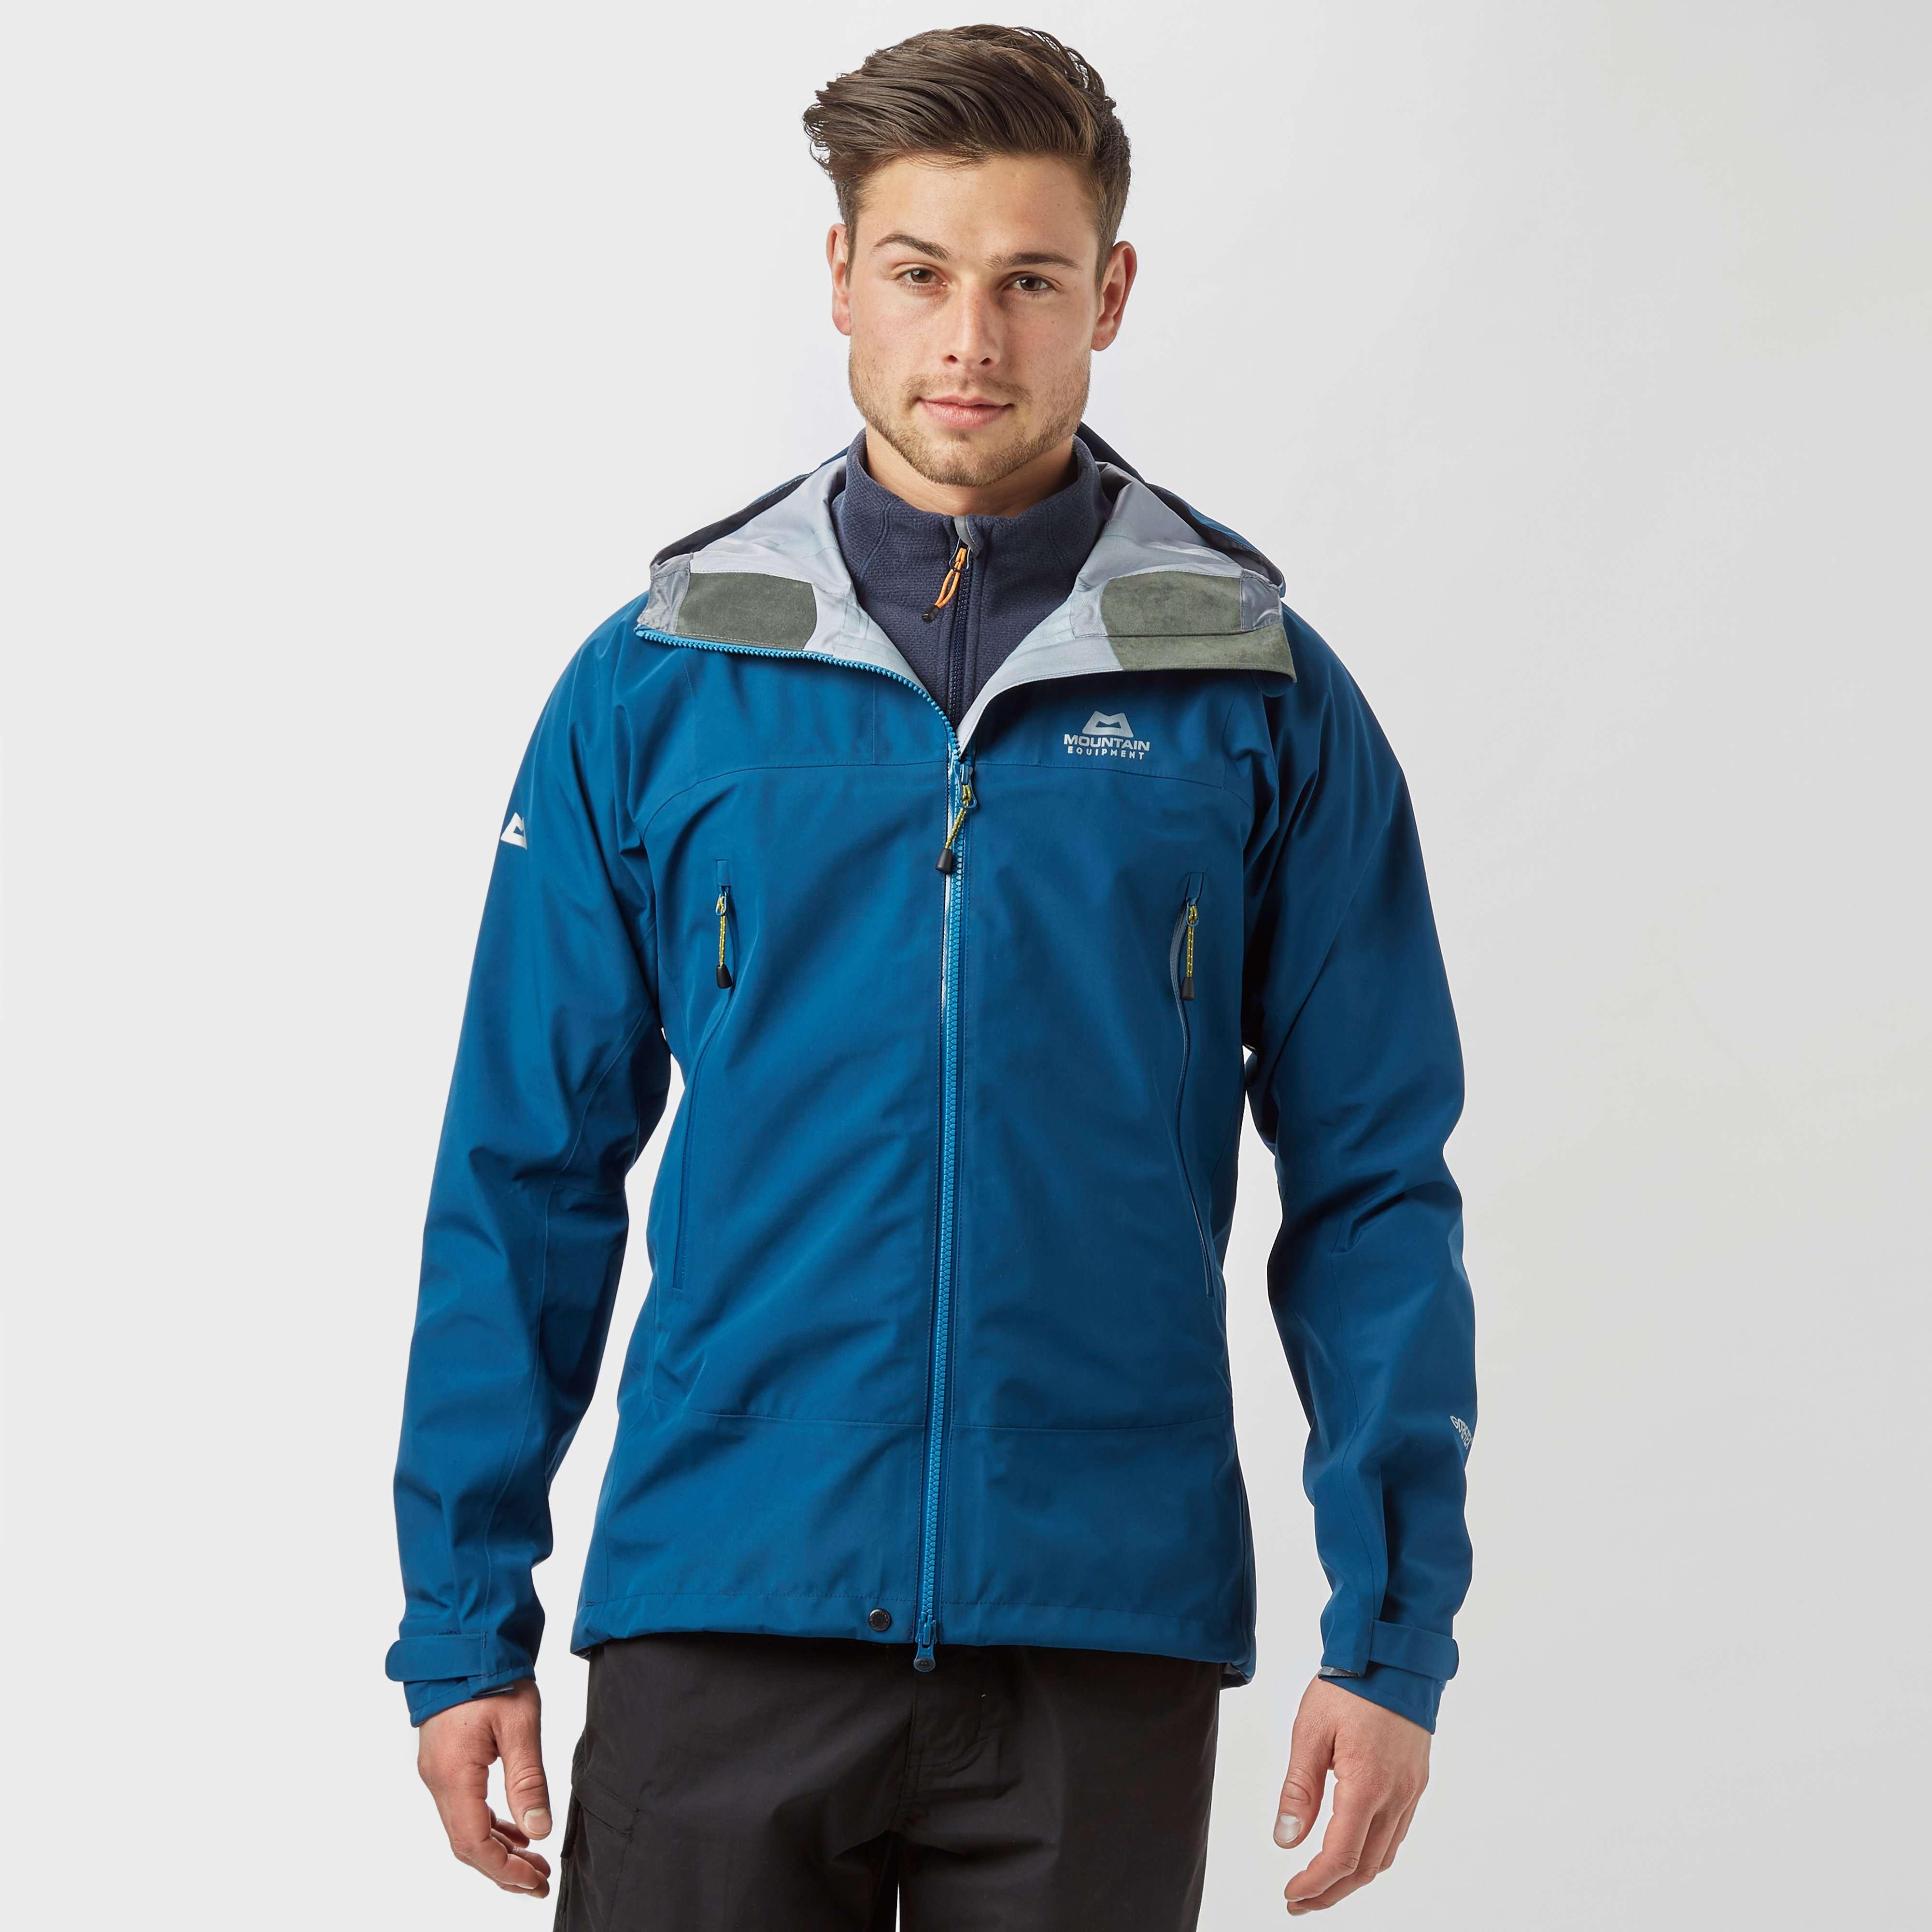 MOUNTAIN EQUIPMENT Men's Rupal GORE-TEX® Jacket